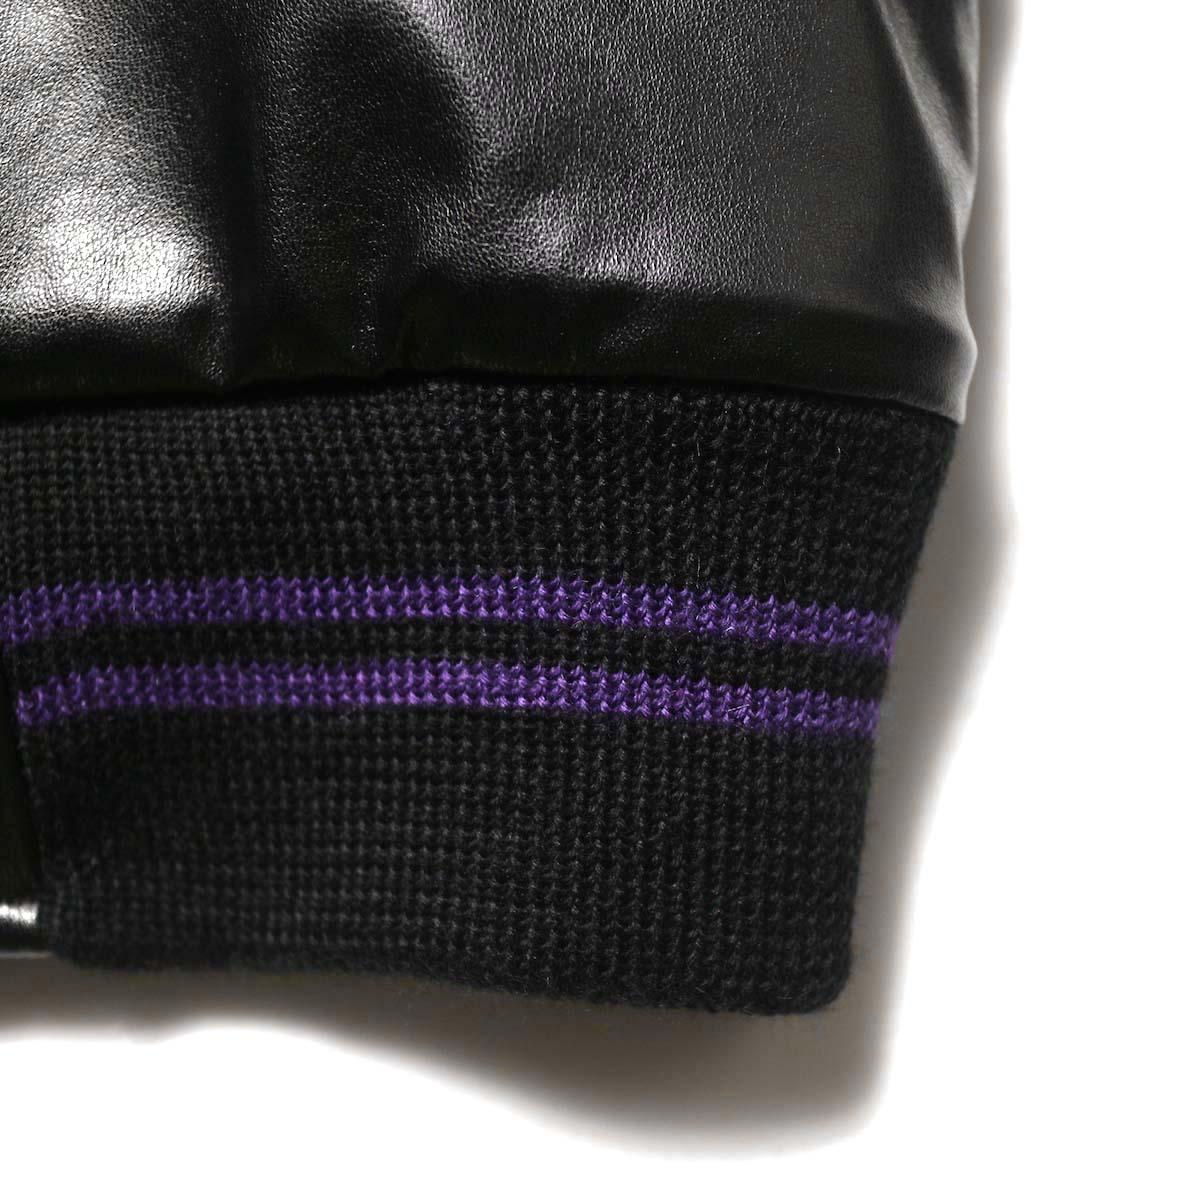 Needles / Award Jacket - Faux Lthr (Black)裾リブ